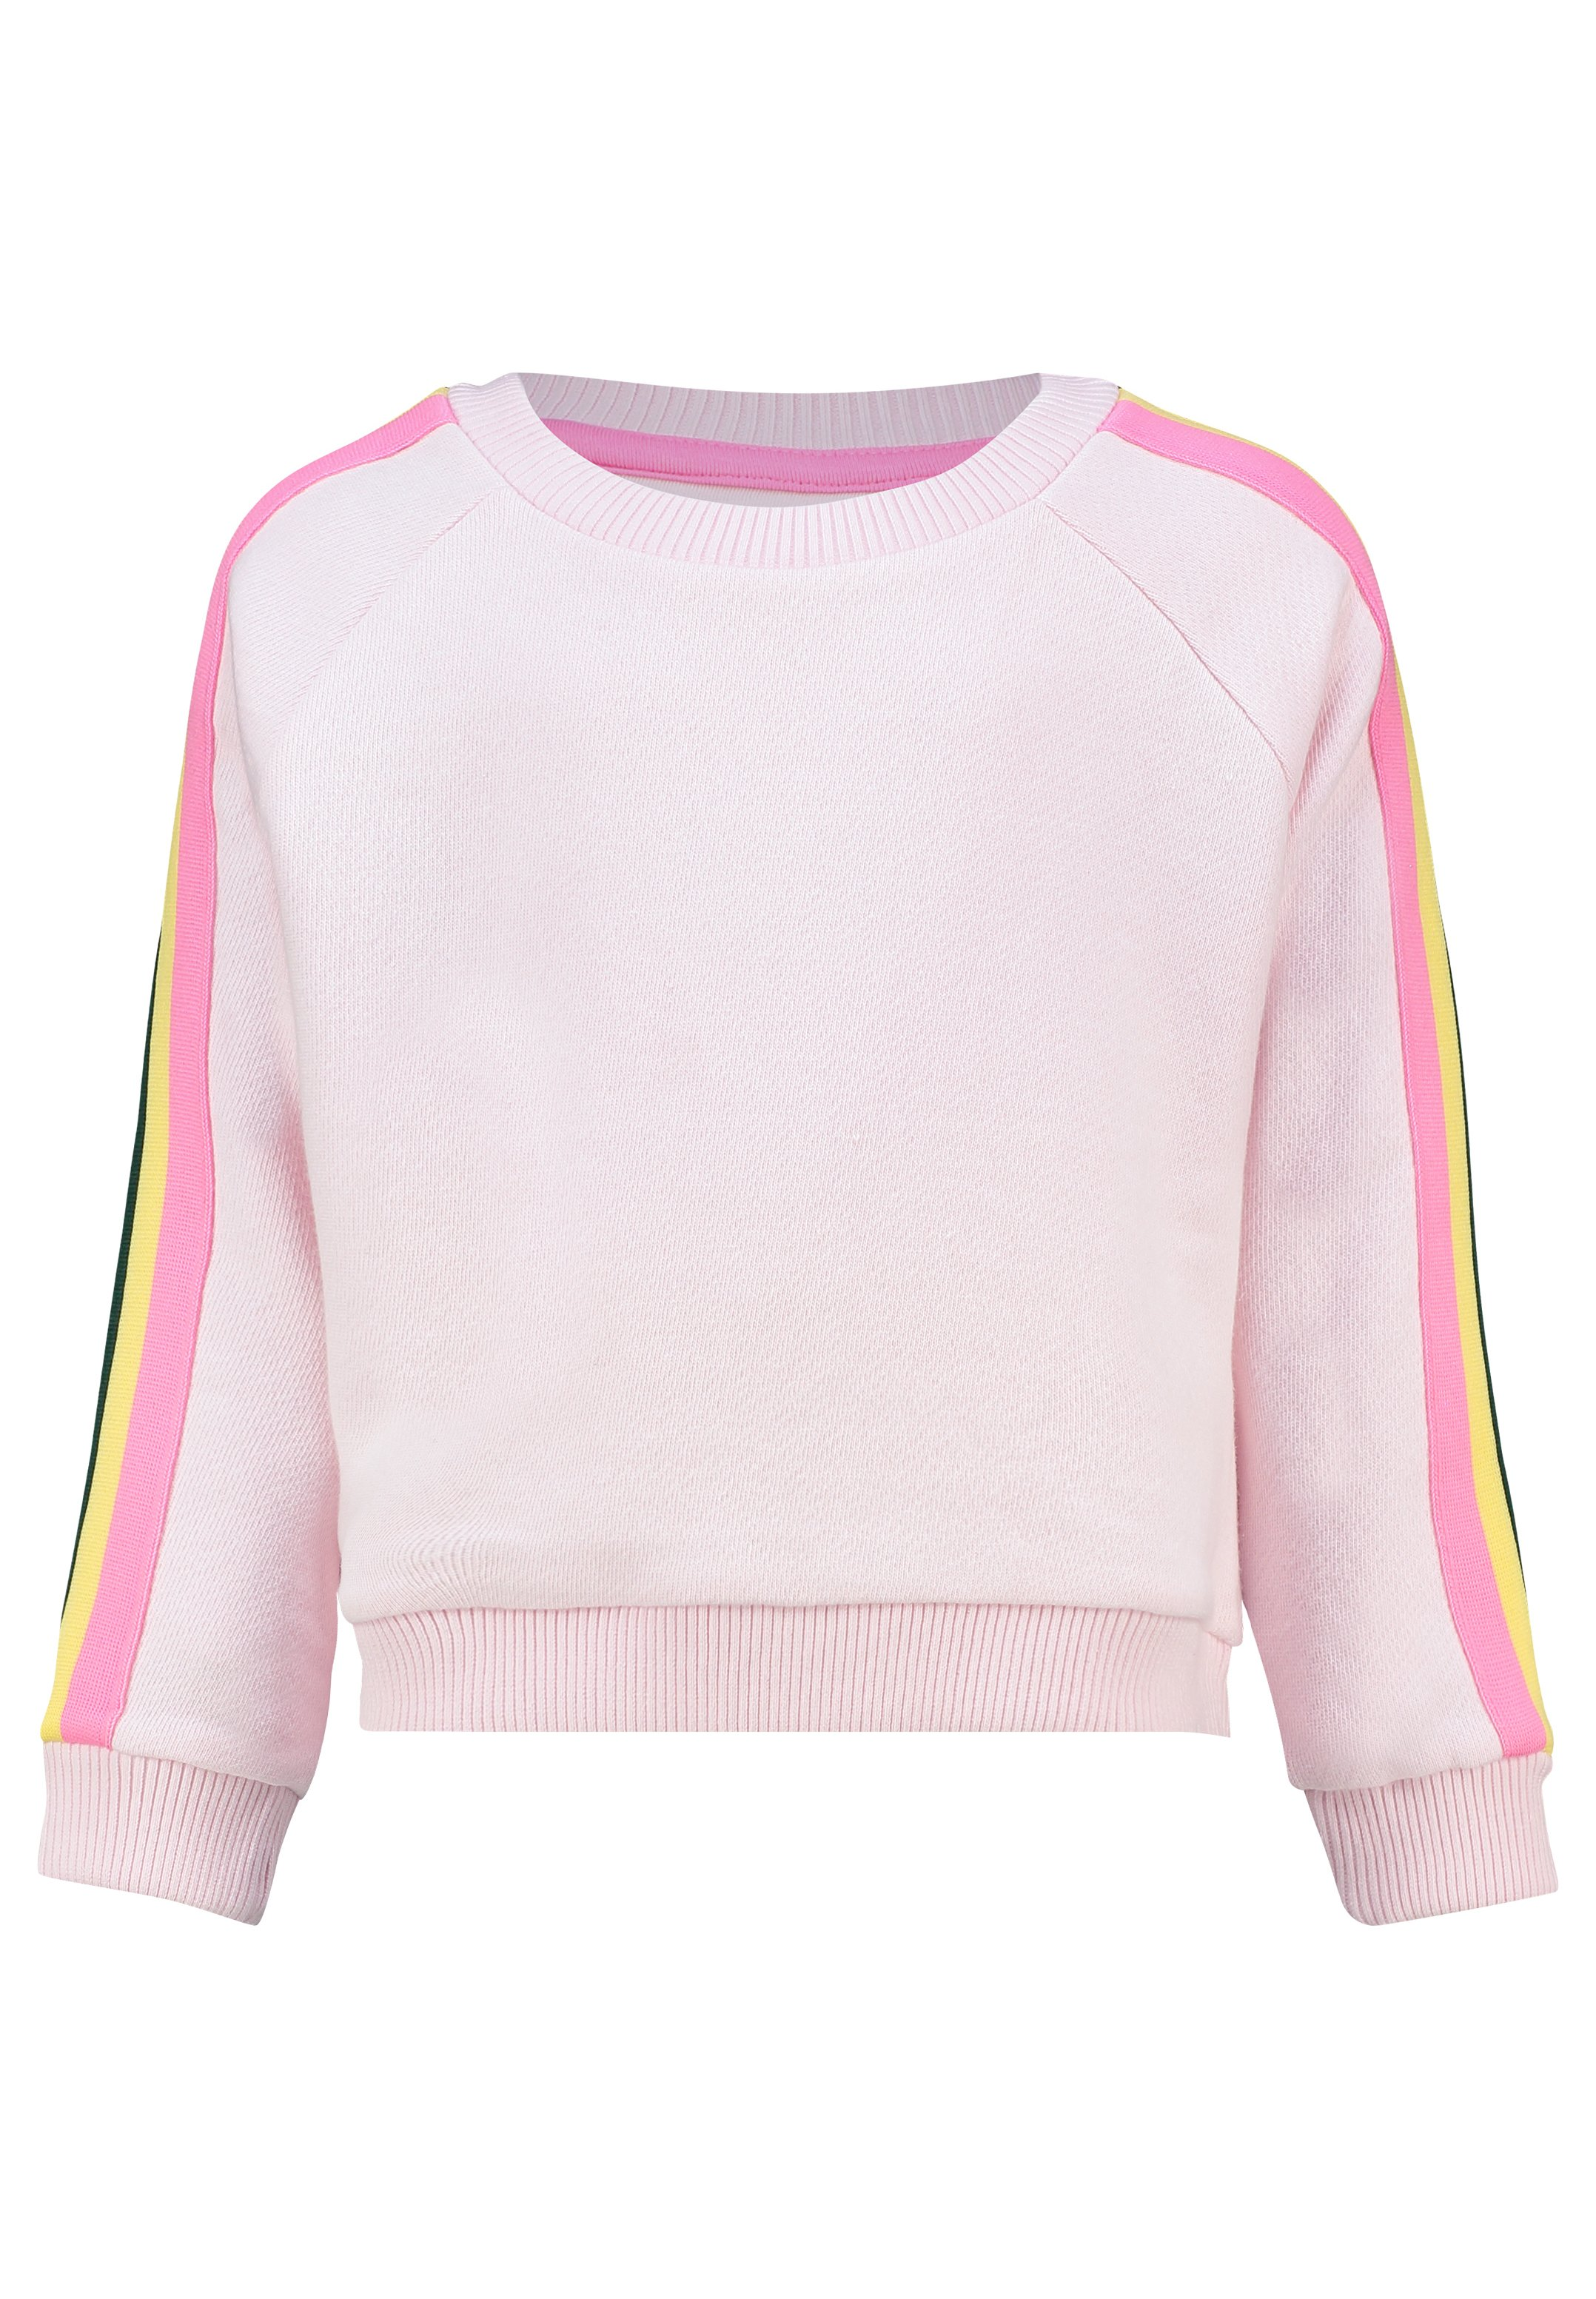 Große Förderung Noppies Sweatshirt - cradle pink | Damenbekleidung 2020